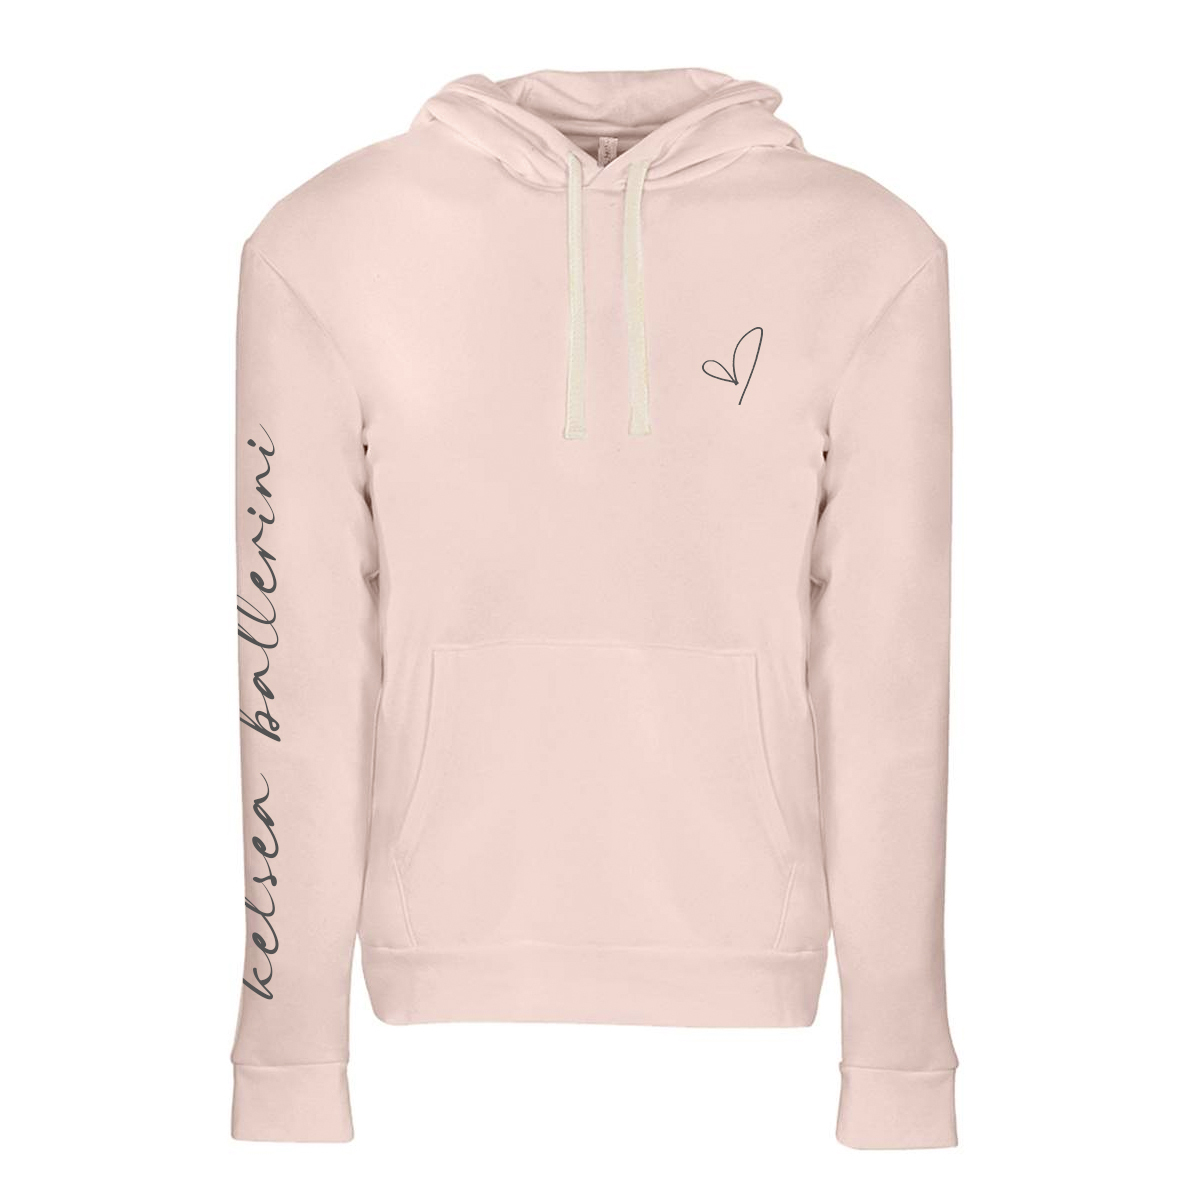 2021 Tour Pink Heart Hoodie